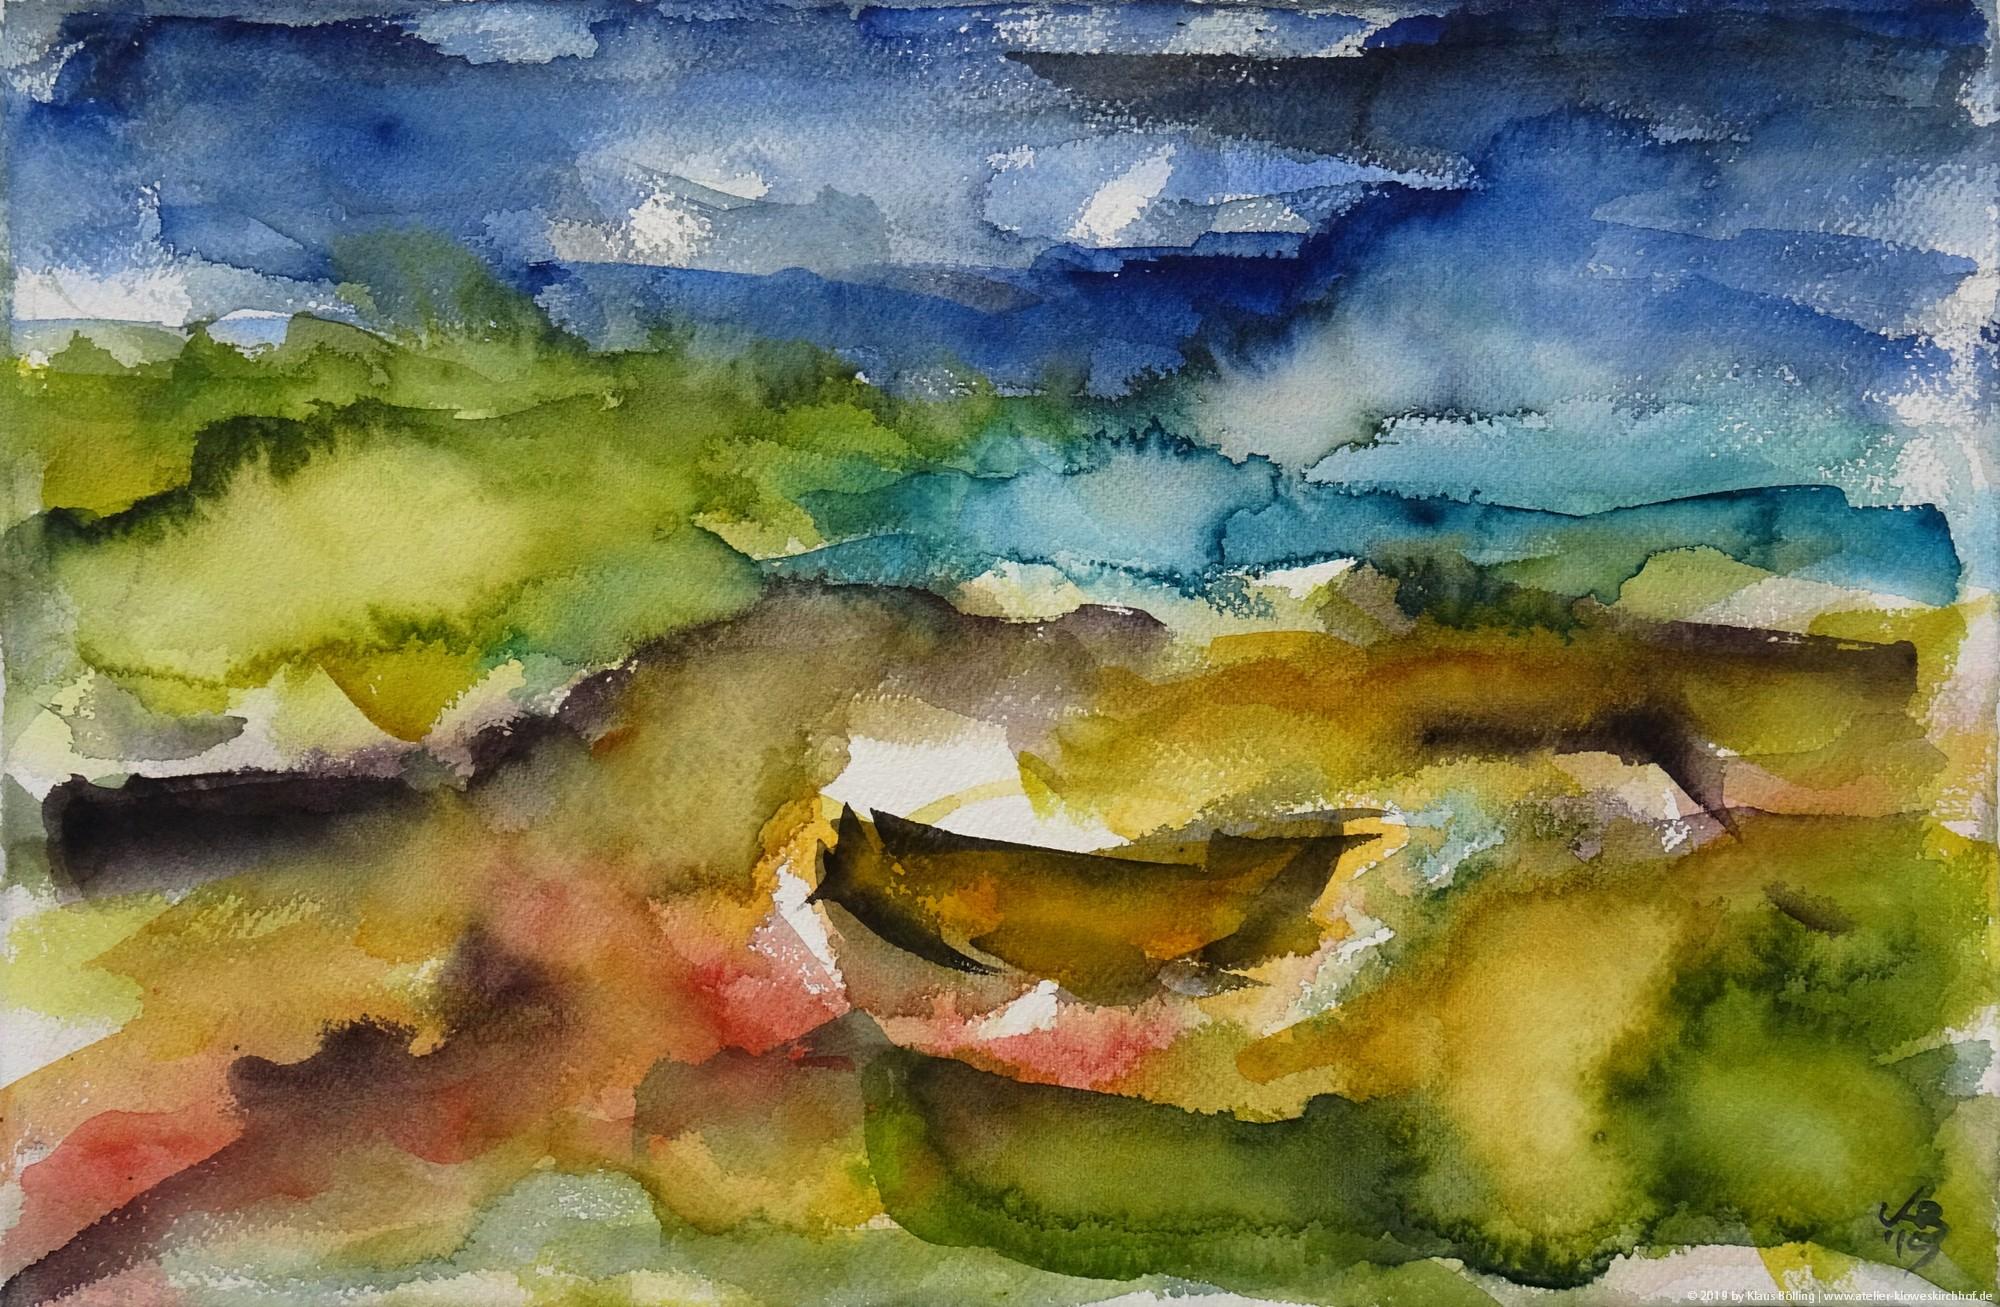 Earsairidh, Barra, Watercolour 50 x 32,5 cm, © 2019 by Klaus Bölling